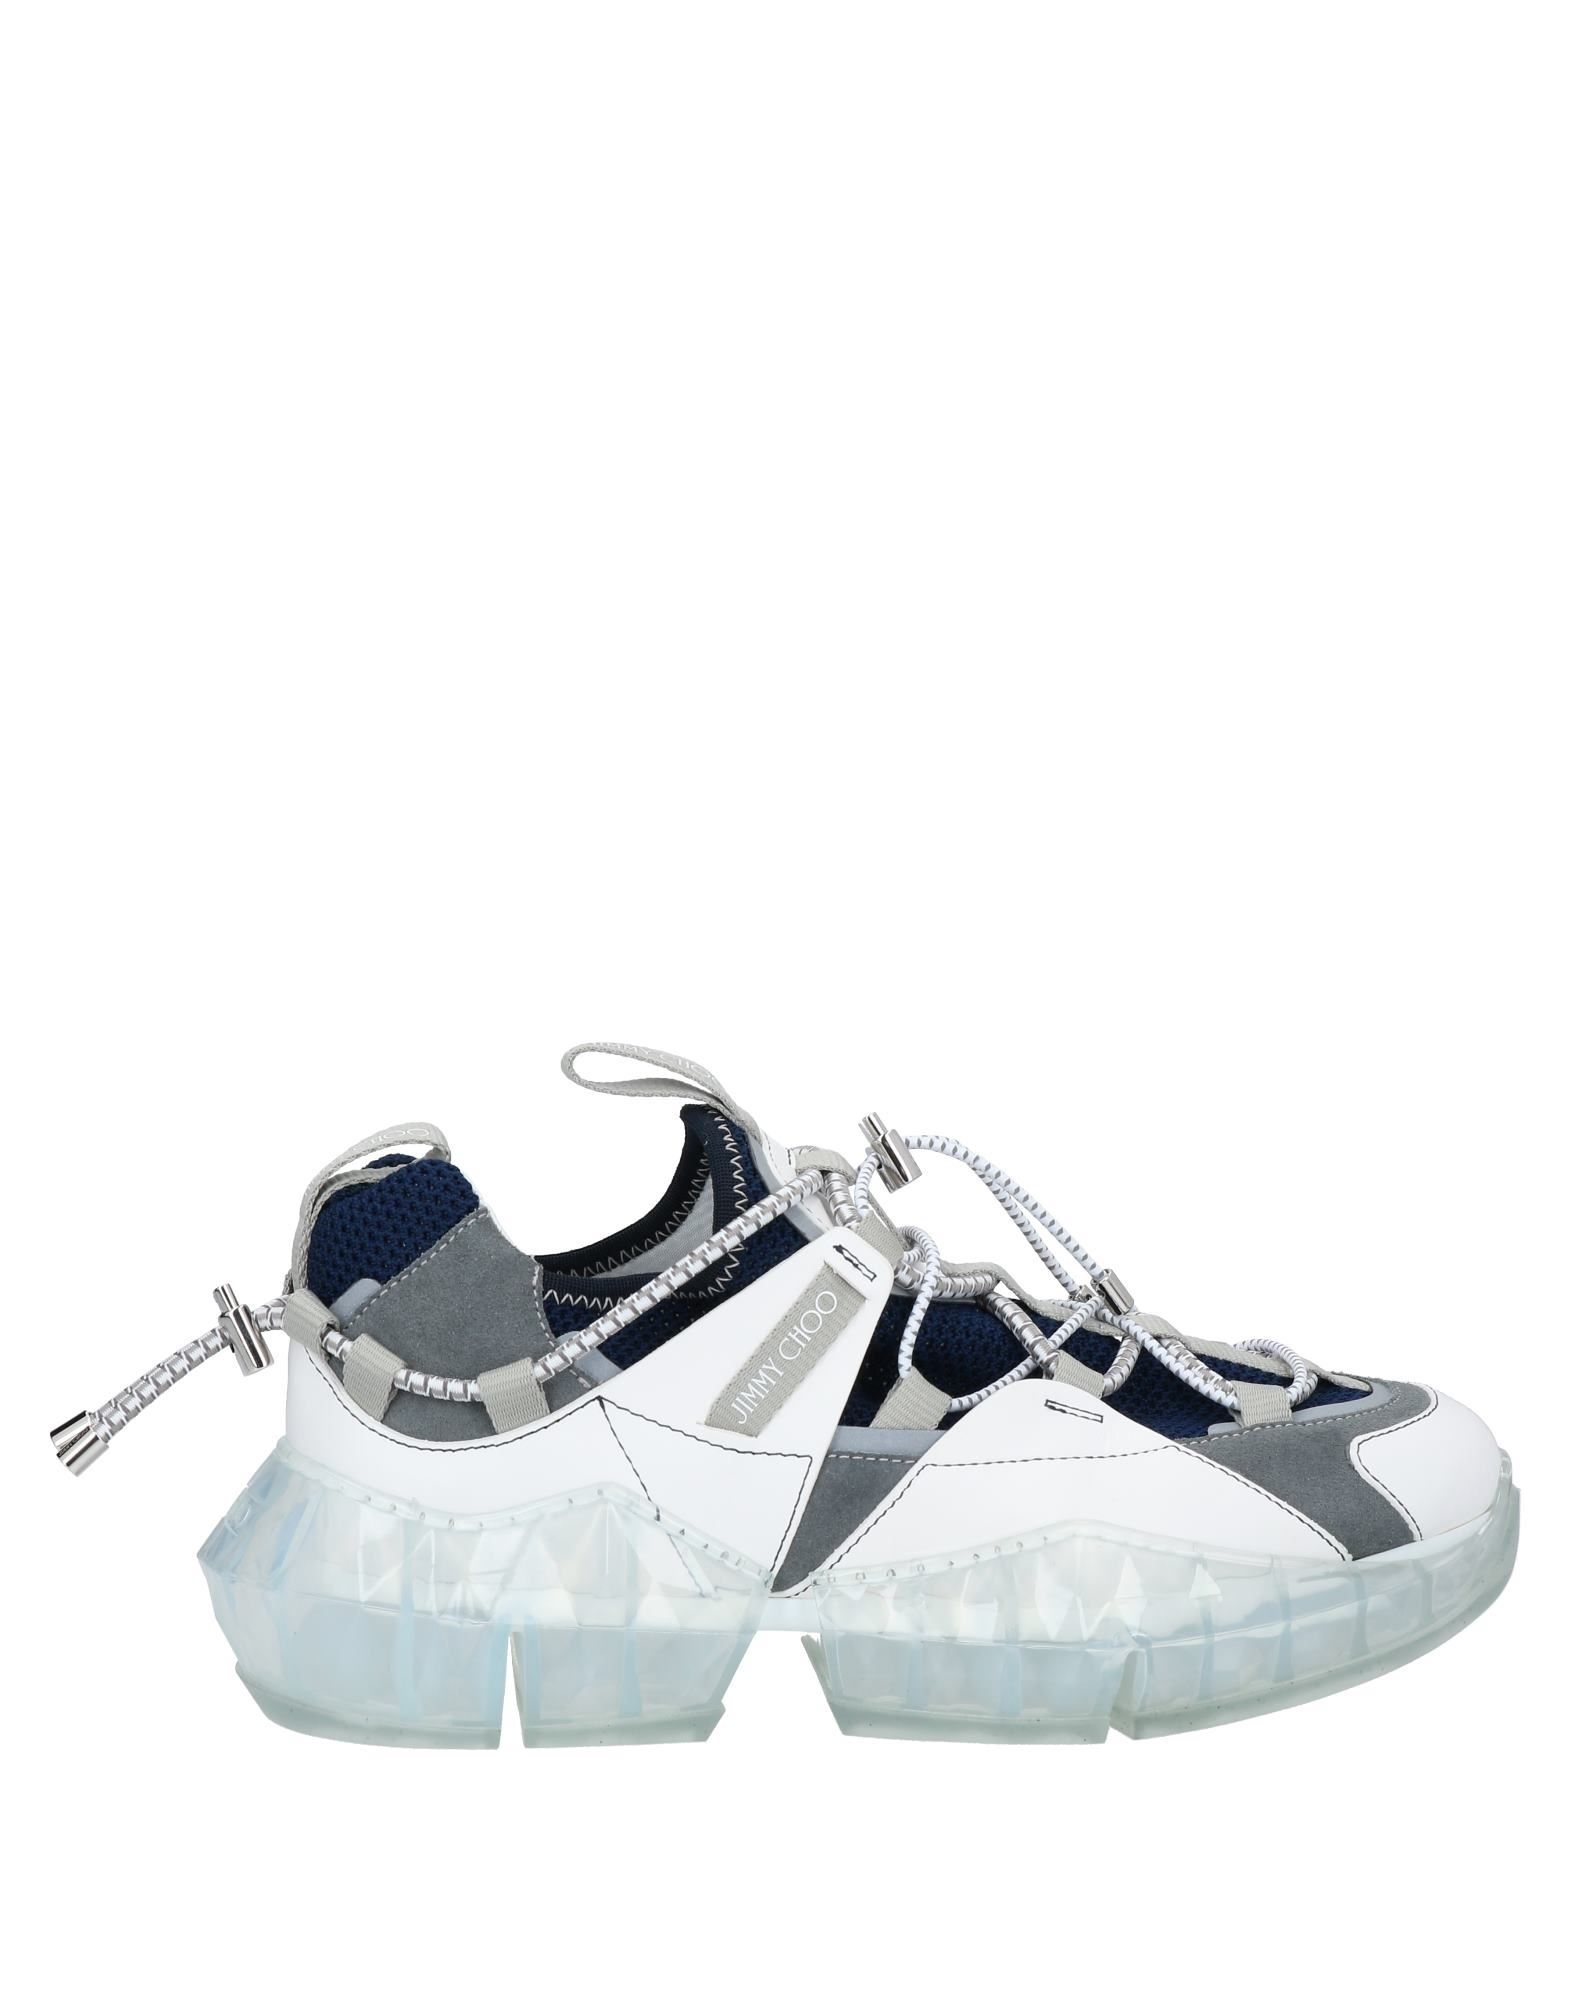 Фото - JIMMY CHOO Низкие кеды и кроссовки jimmy choo высокие кеды и кроссовки